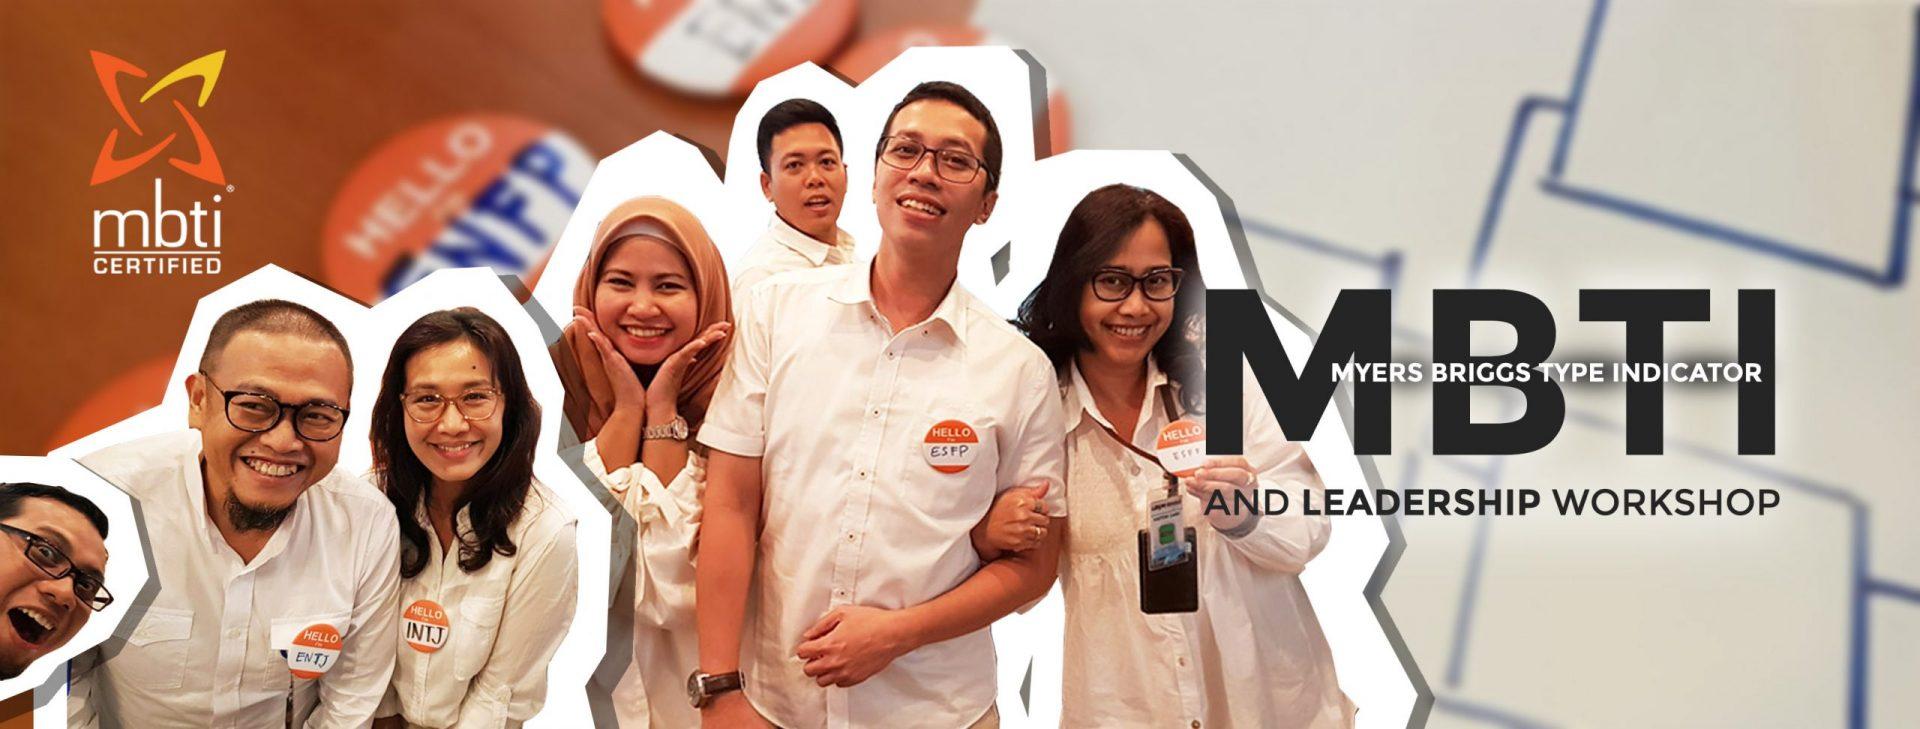 Training MBTI Official bersama Mitologi Inspira untuk Leadership dan Teamwork, Communication, MBTI Indonesia , dan Tes MBTI Resmi Indonesia